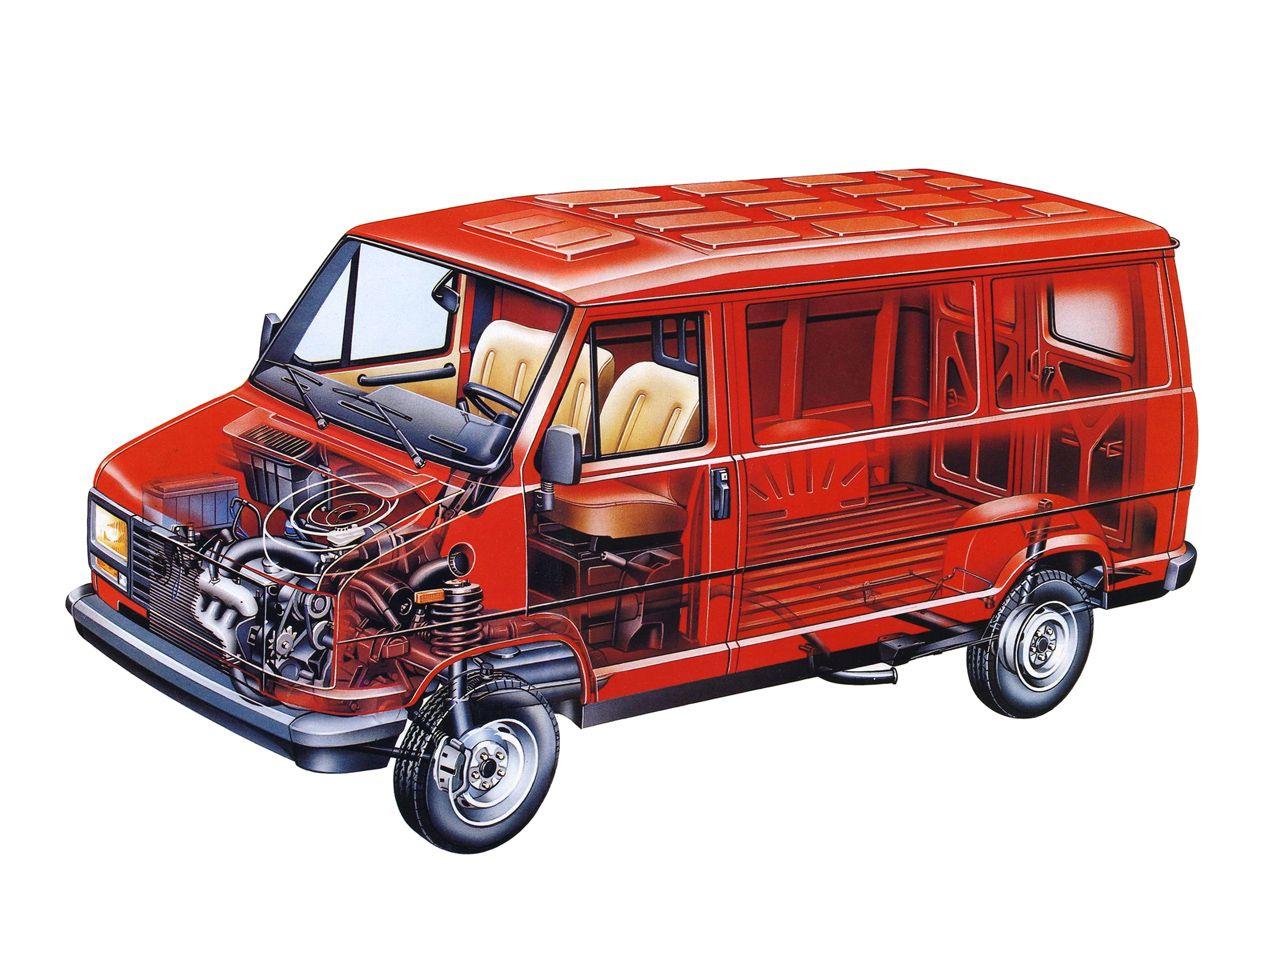 Mercedes benz 280 ge swb w460 1979 01 1990 pictures to pin - 1981 1990 Peugeot J5 Panel Van Illustration Unattributed